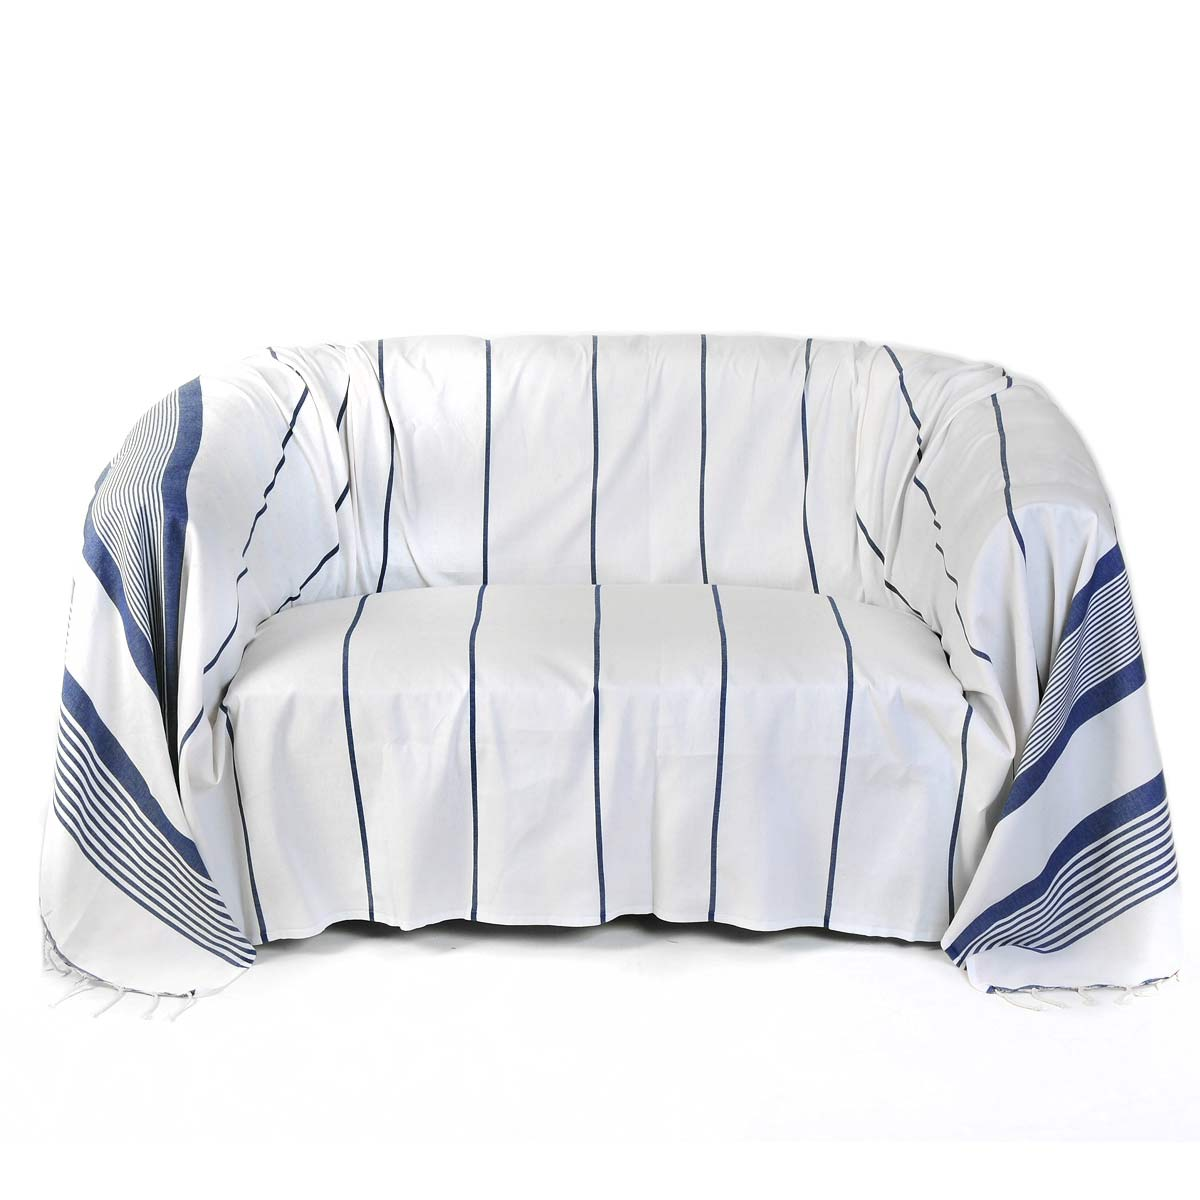 CASABLANCA - Jeté de canapé coton fond blanc rayures bleu 200 x 300